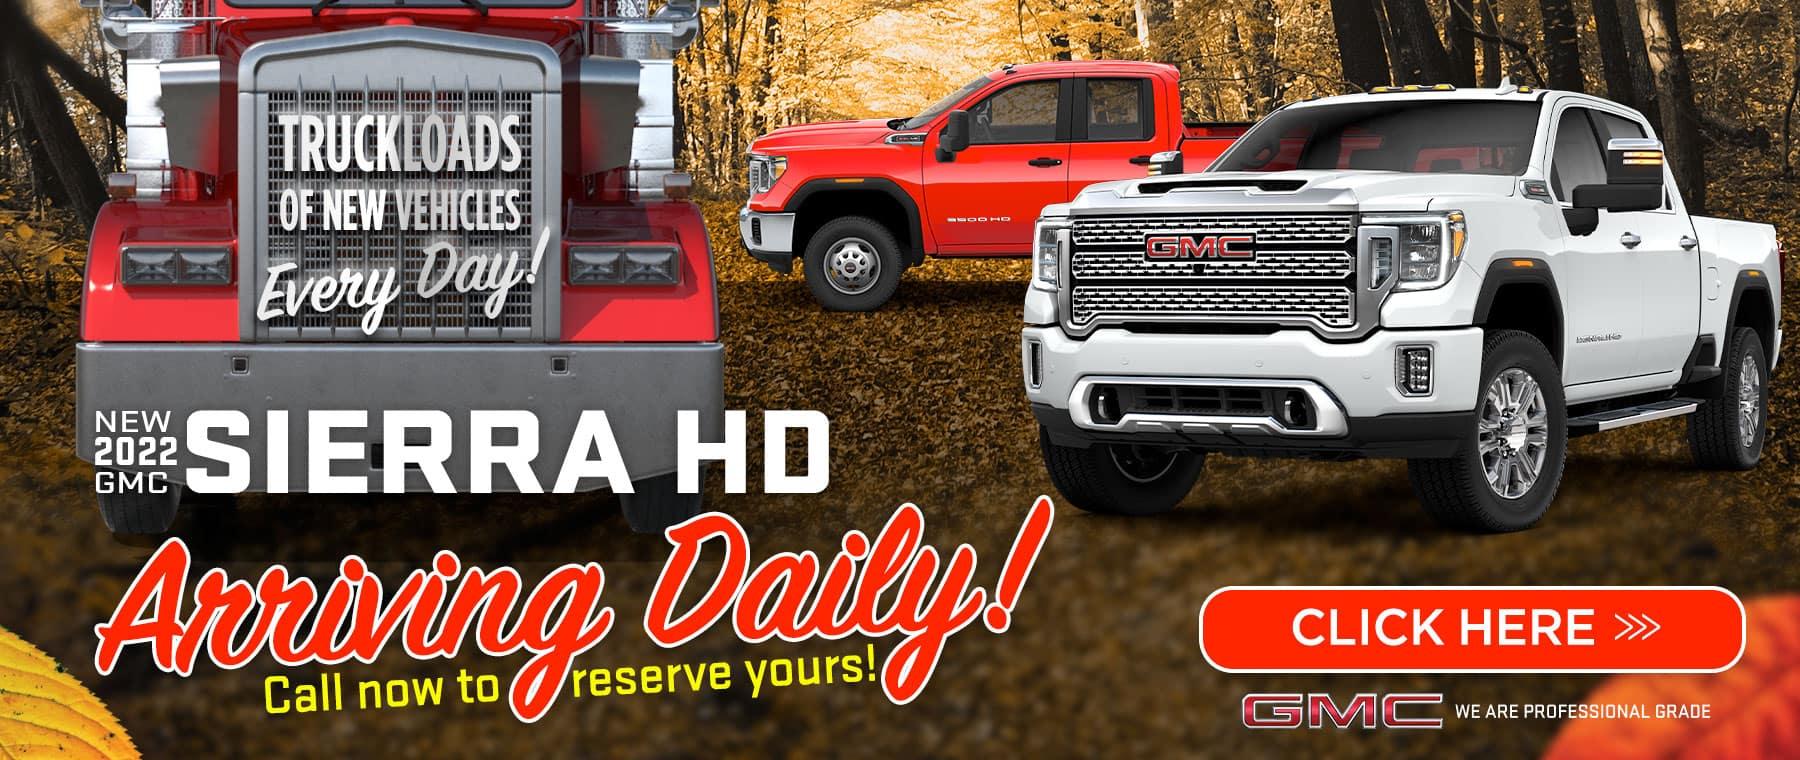 New 2022 GMC Sierra HD - Arriving Daily